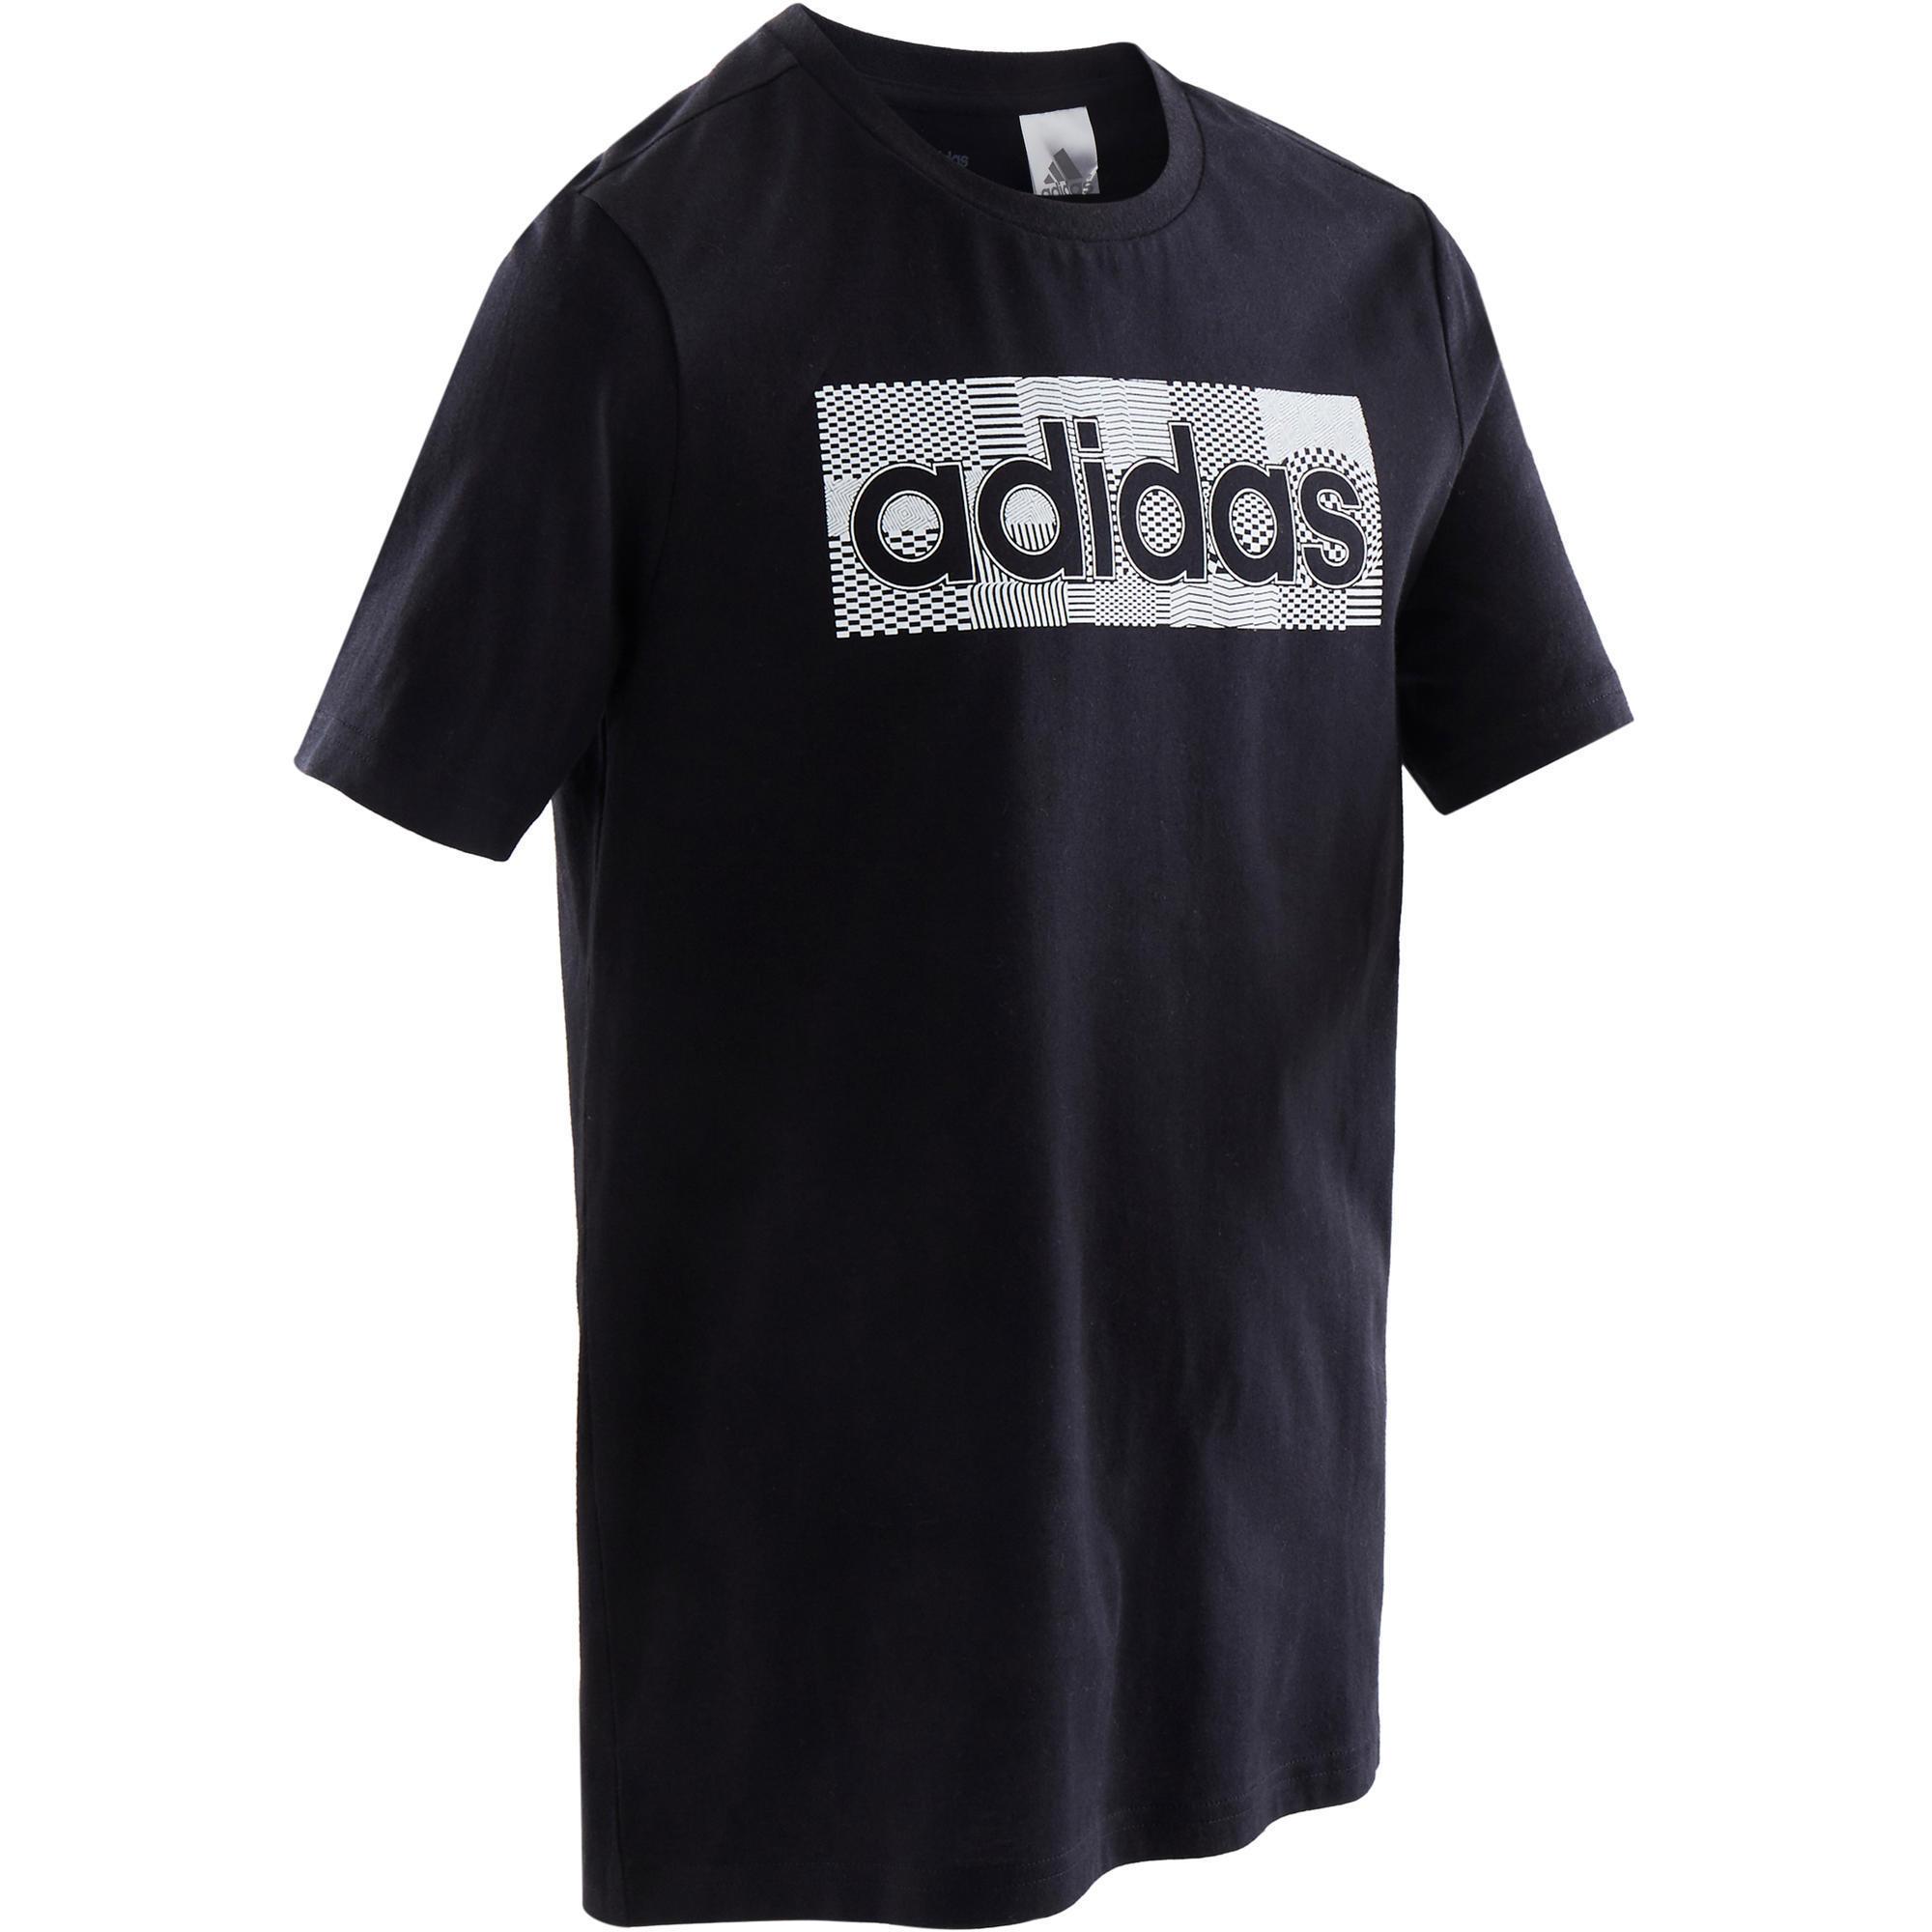 Camiseta Adidas infantil, entrega en tienda gratis